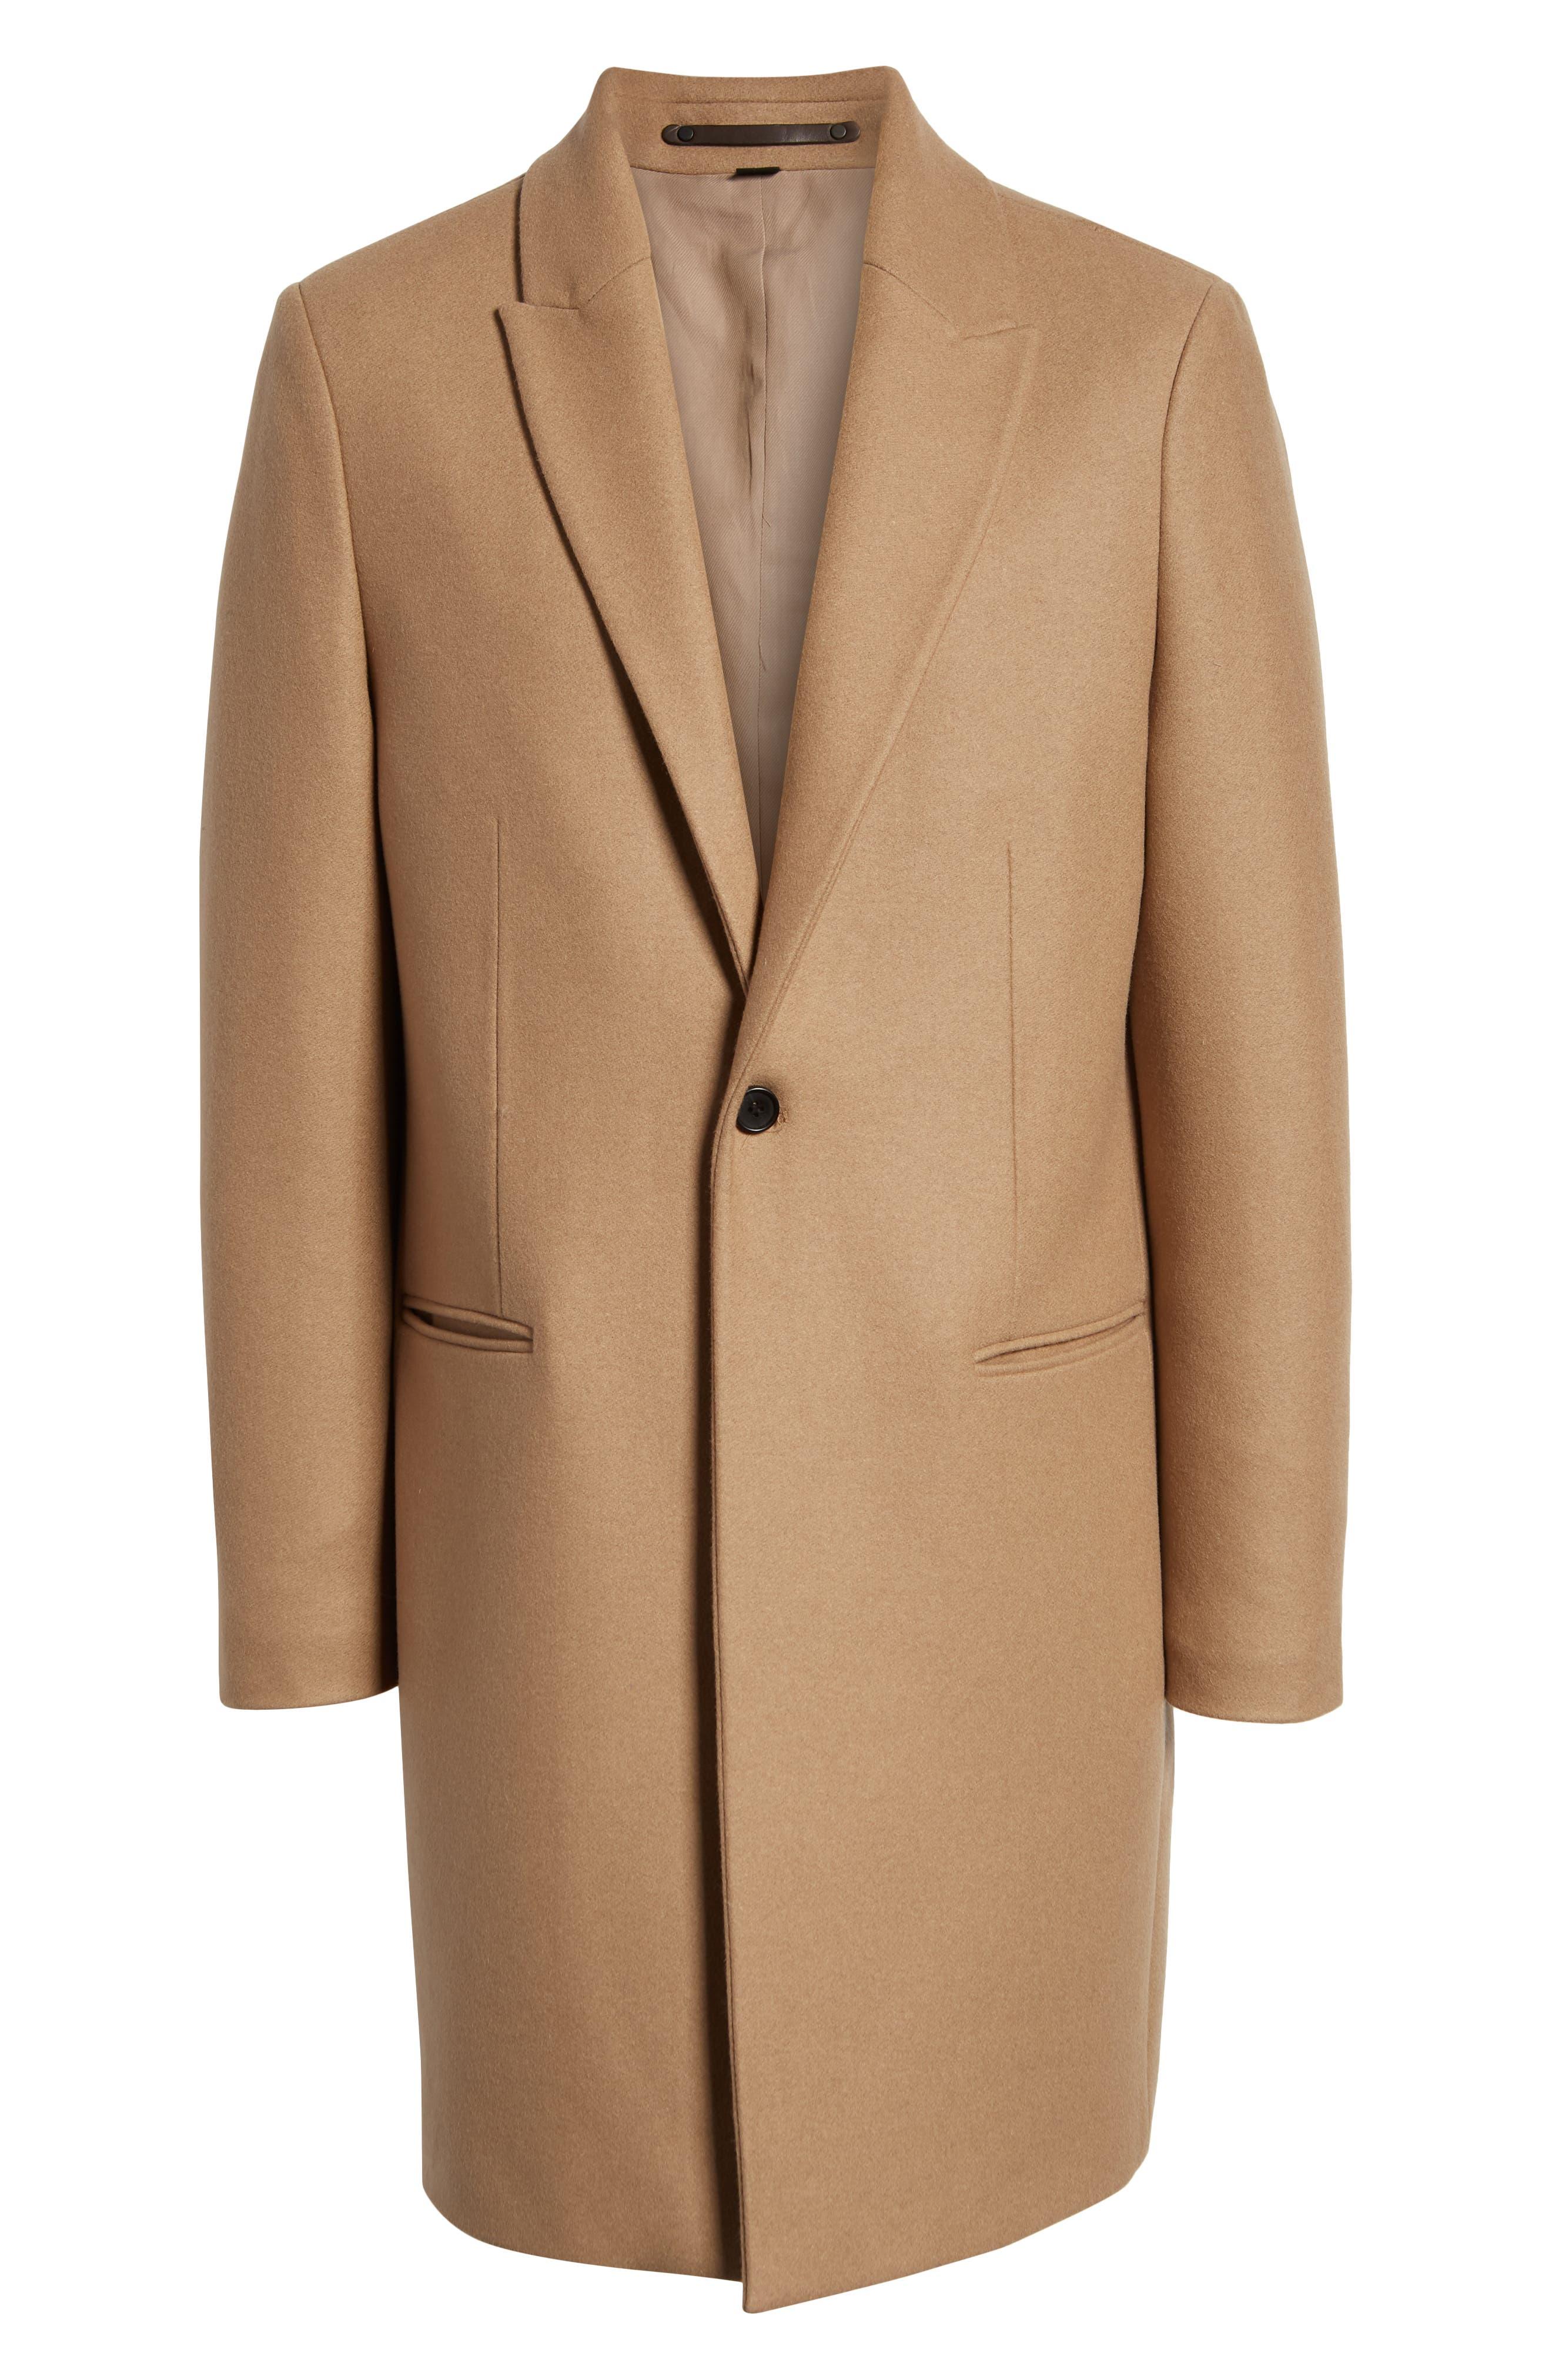 Tulsen Regular Fit Wool Topcoat,                             Alternate thumbnail 5, color,                             200